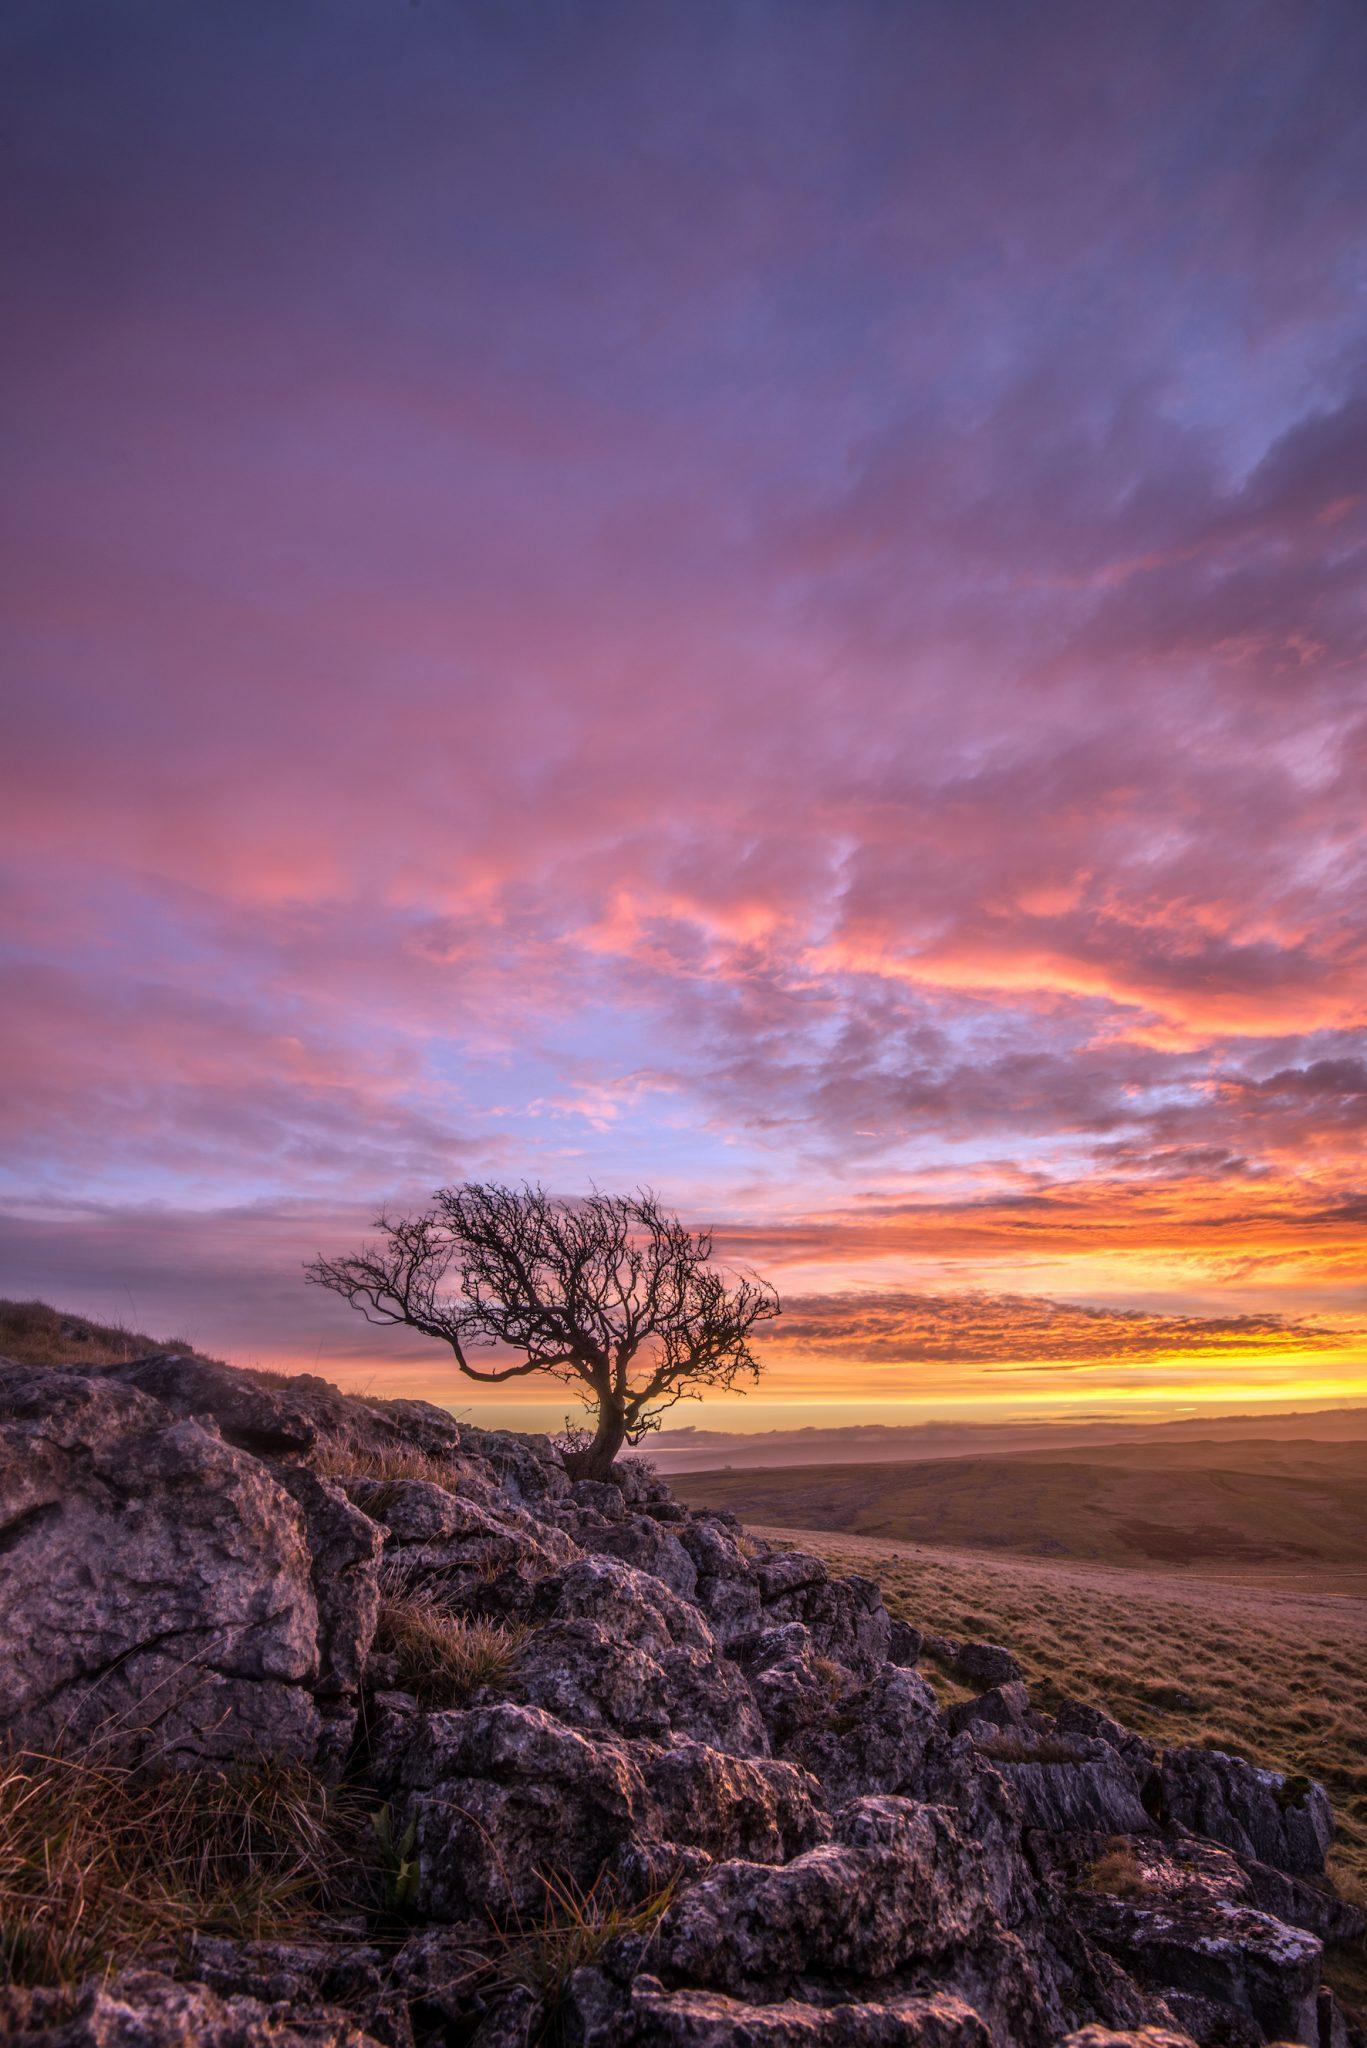 photo of tree at sunset